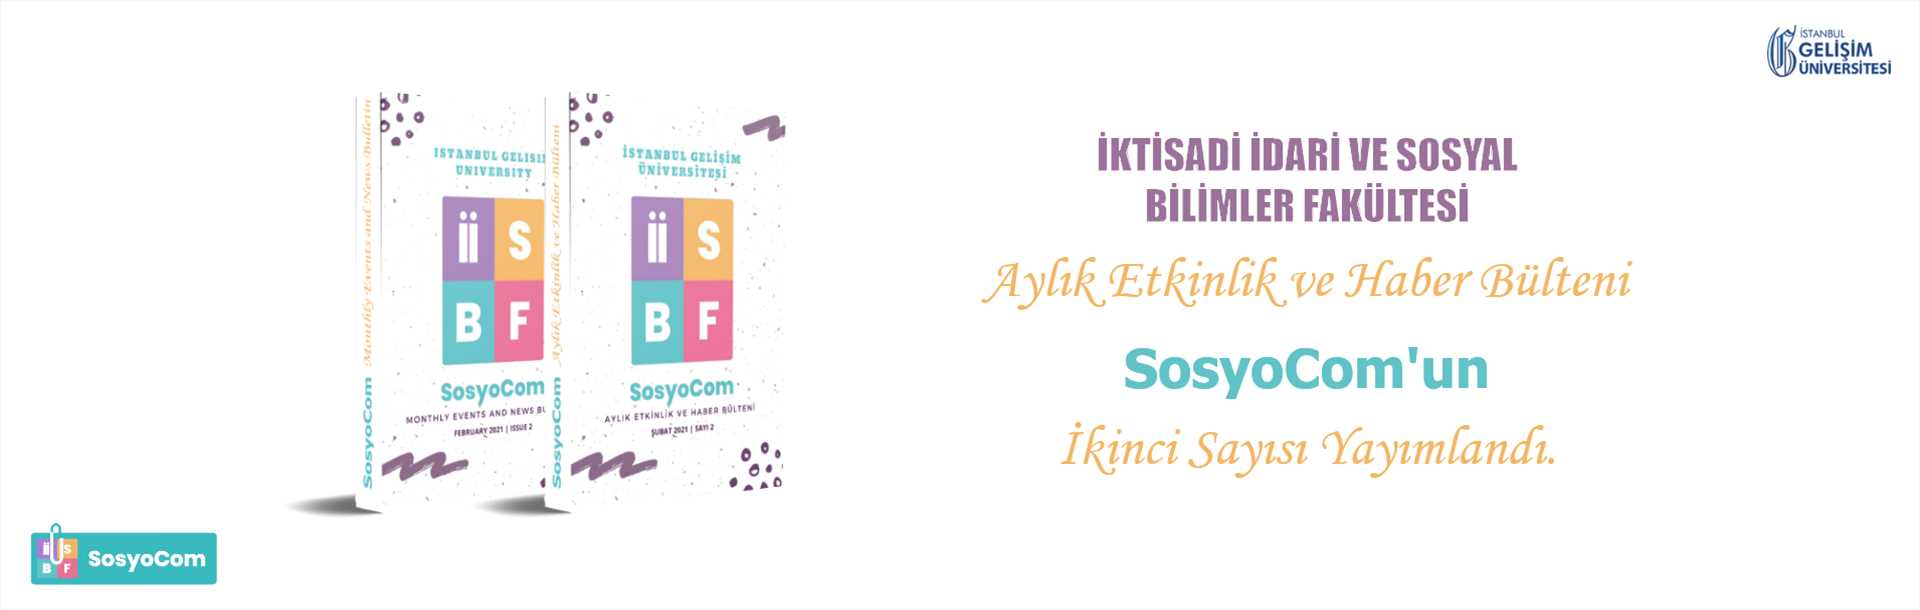 sosyo.com